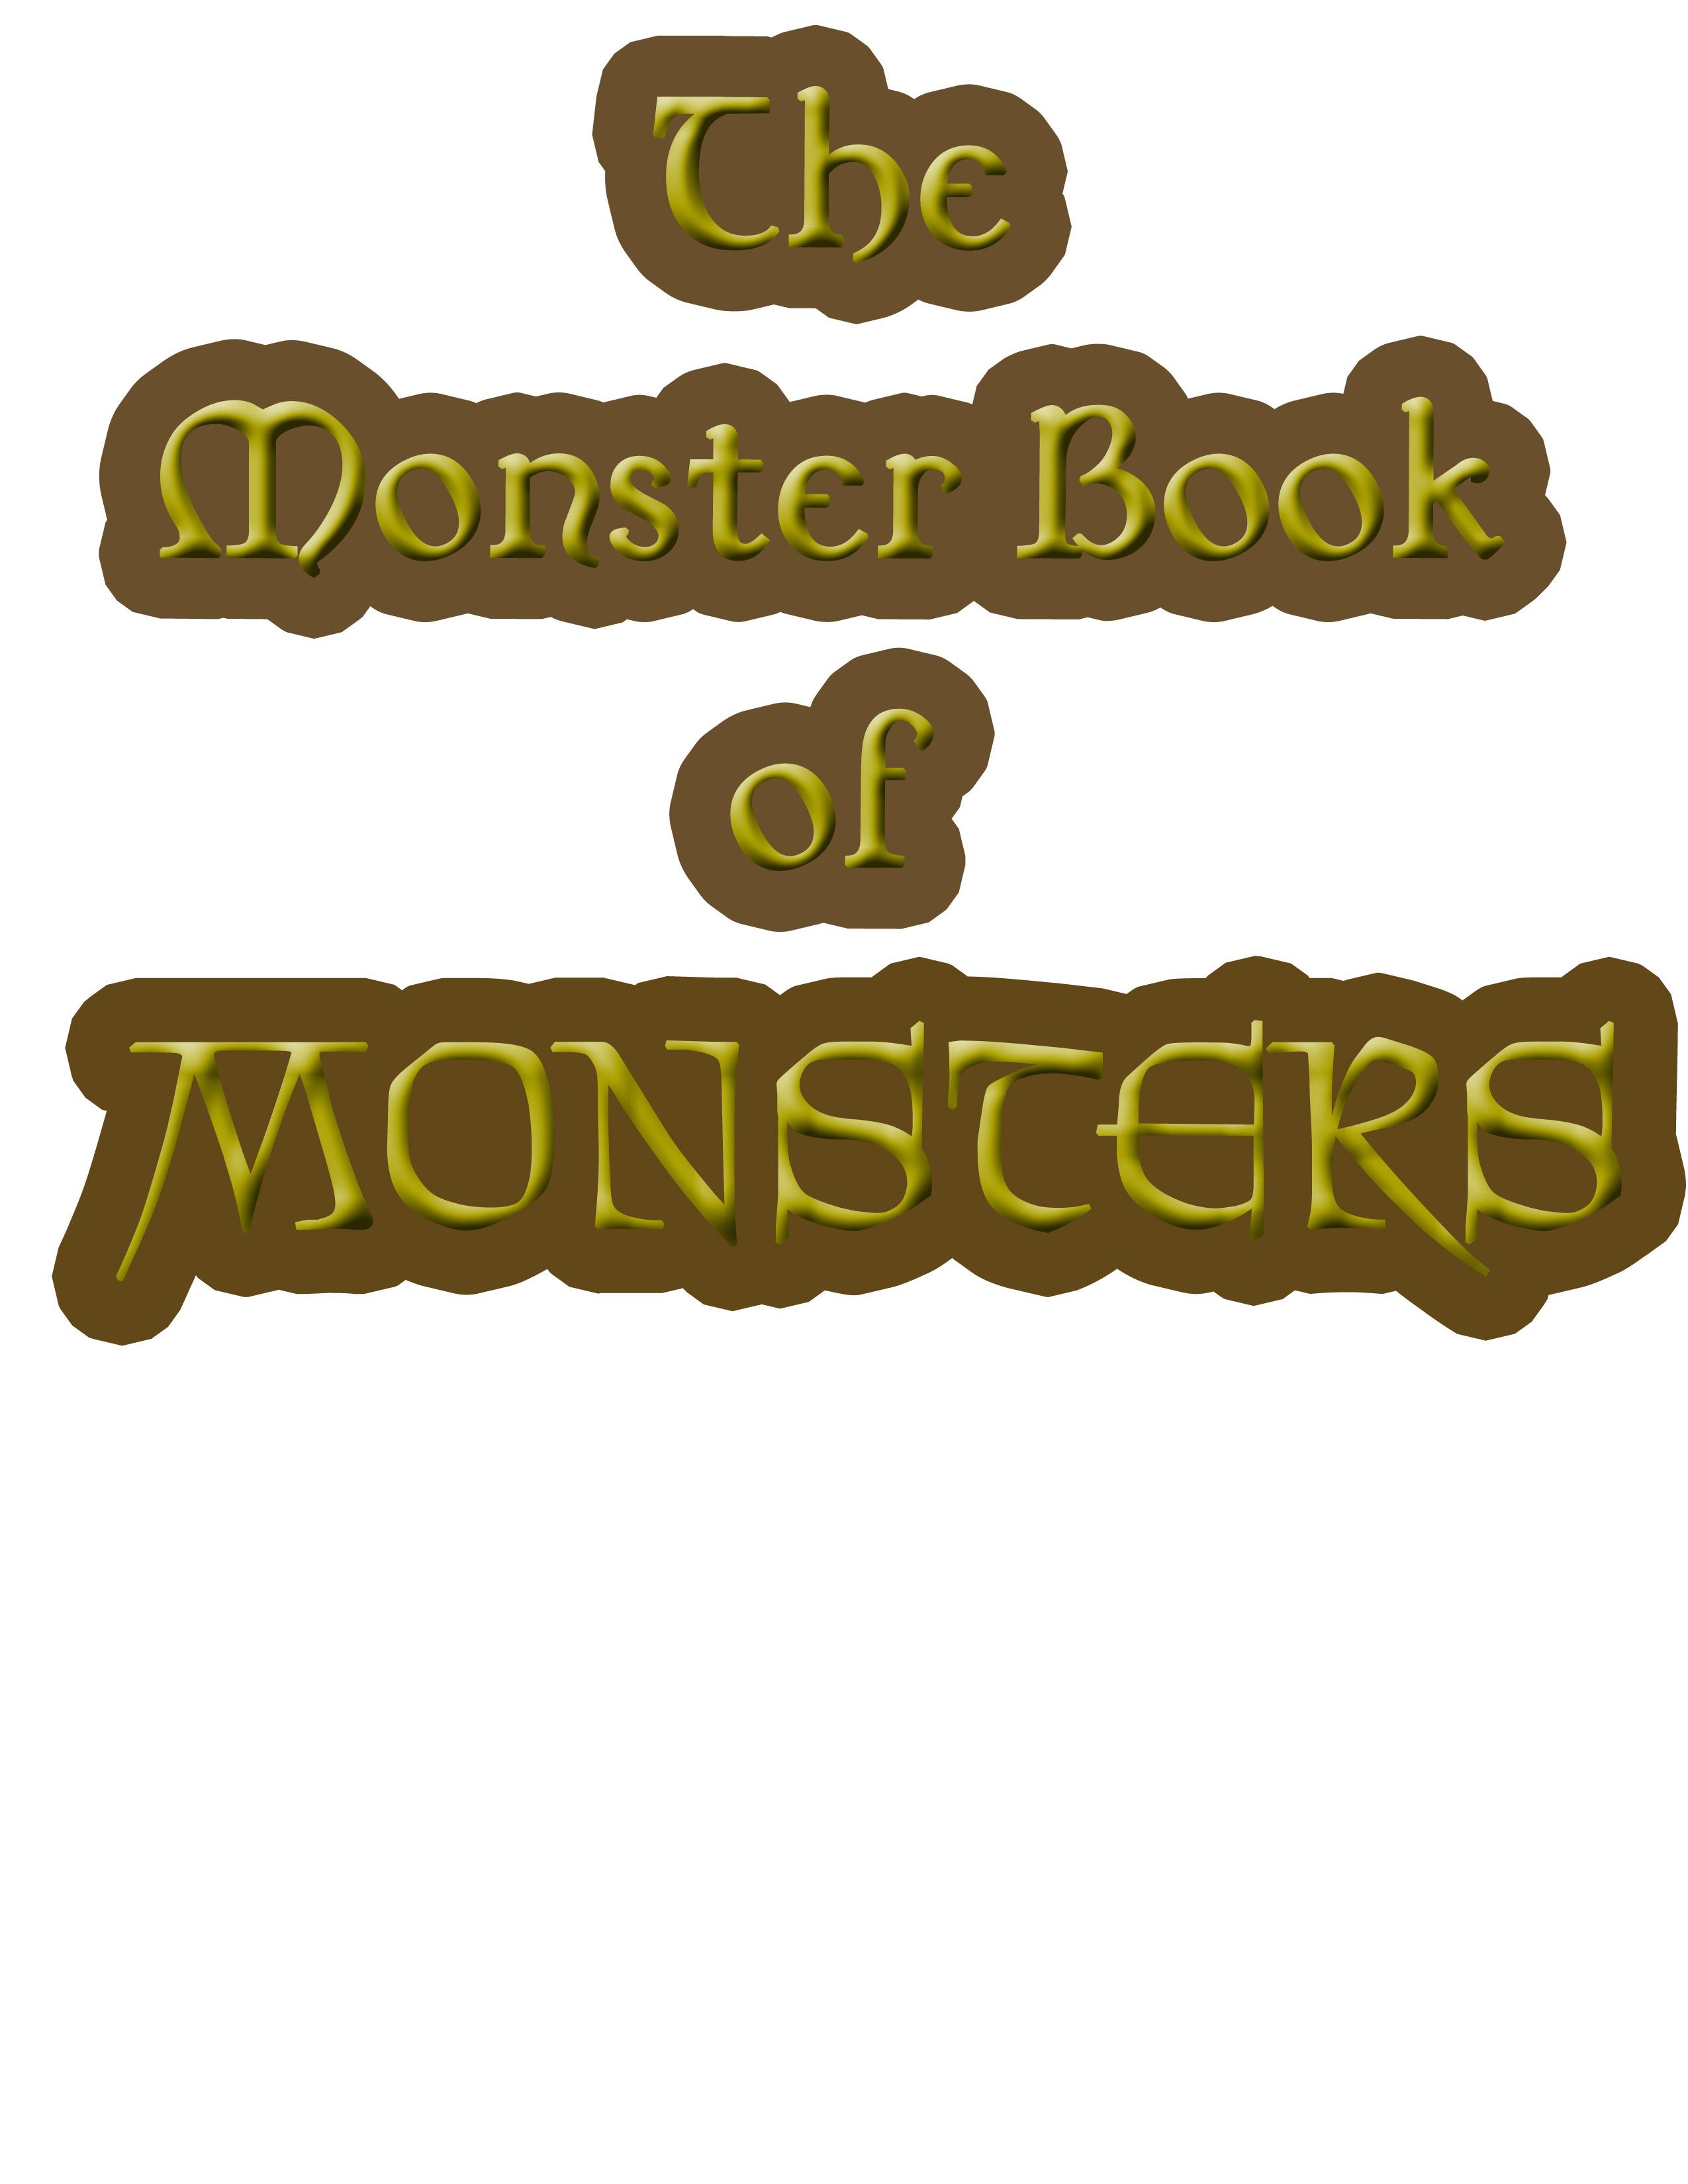 Making The Monster Book Of Monsters Samantha Kamilos